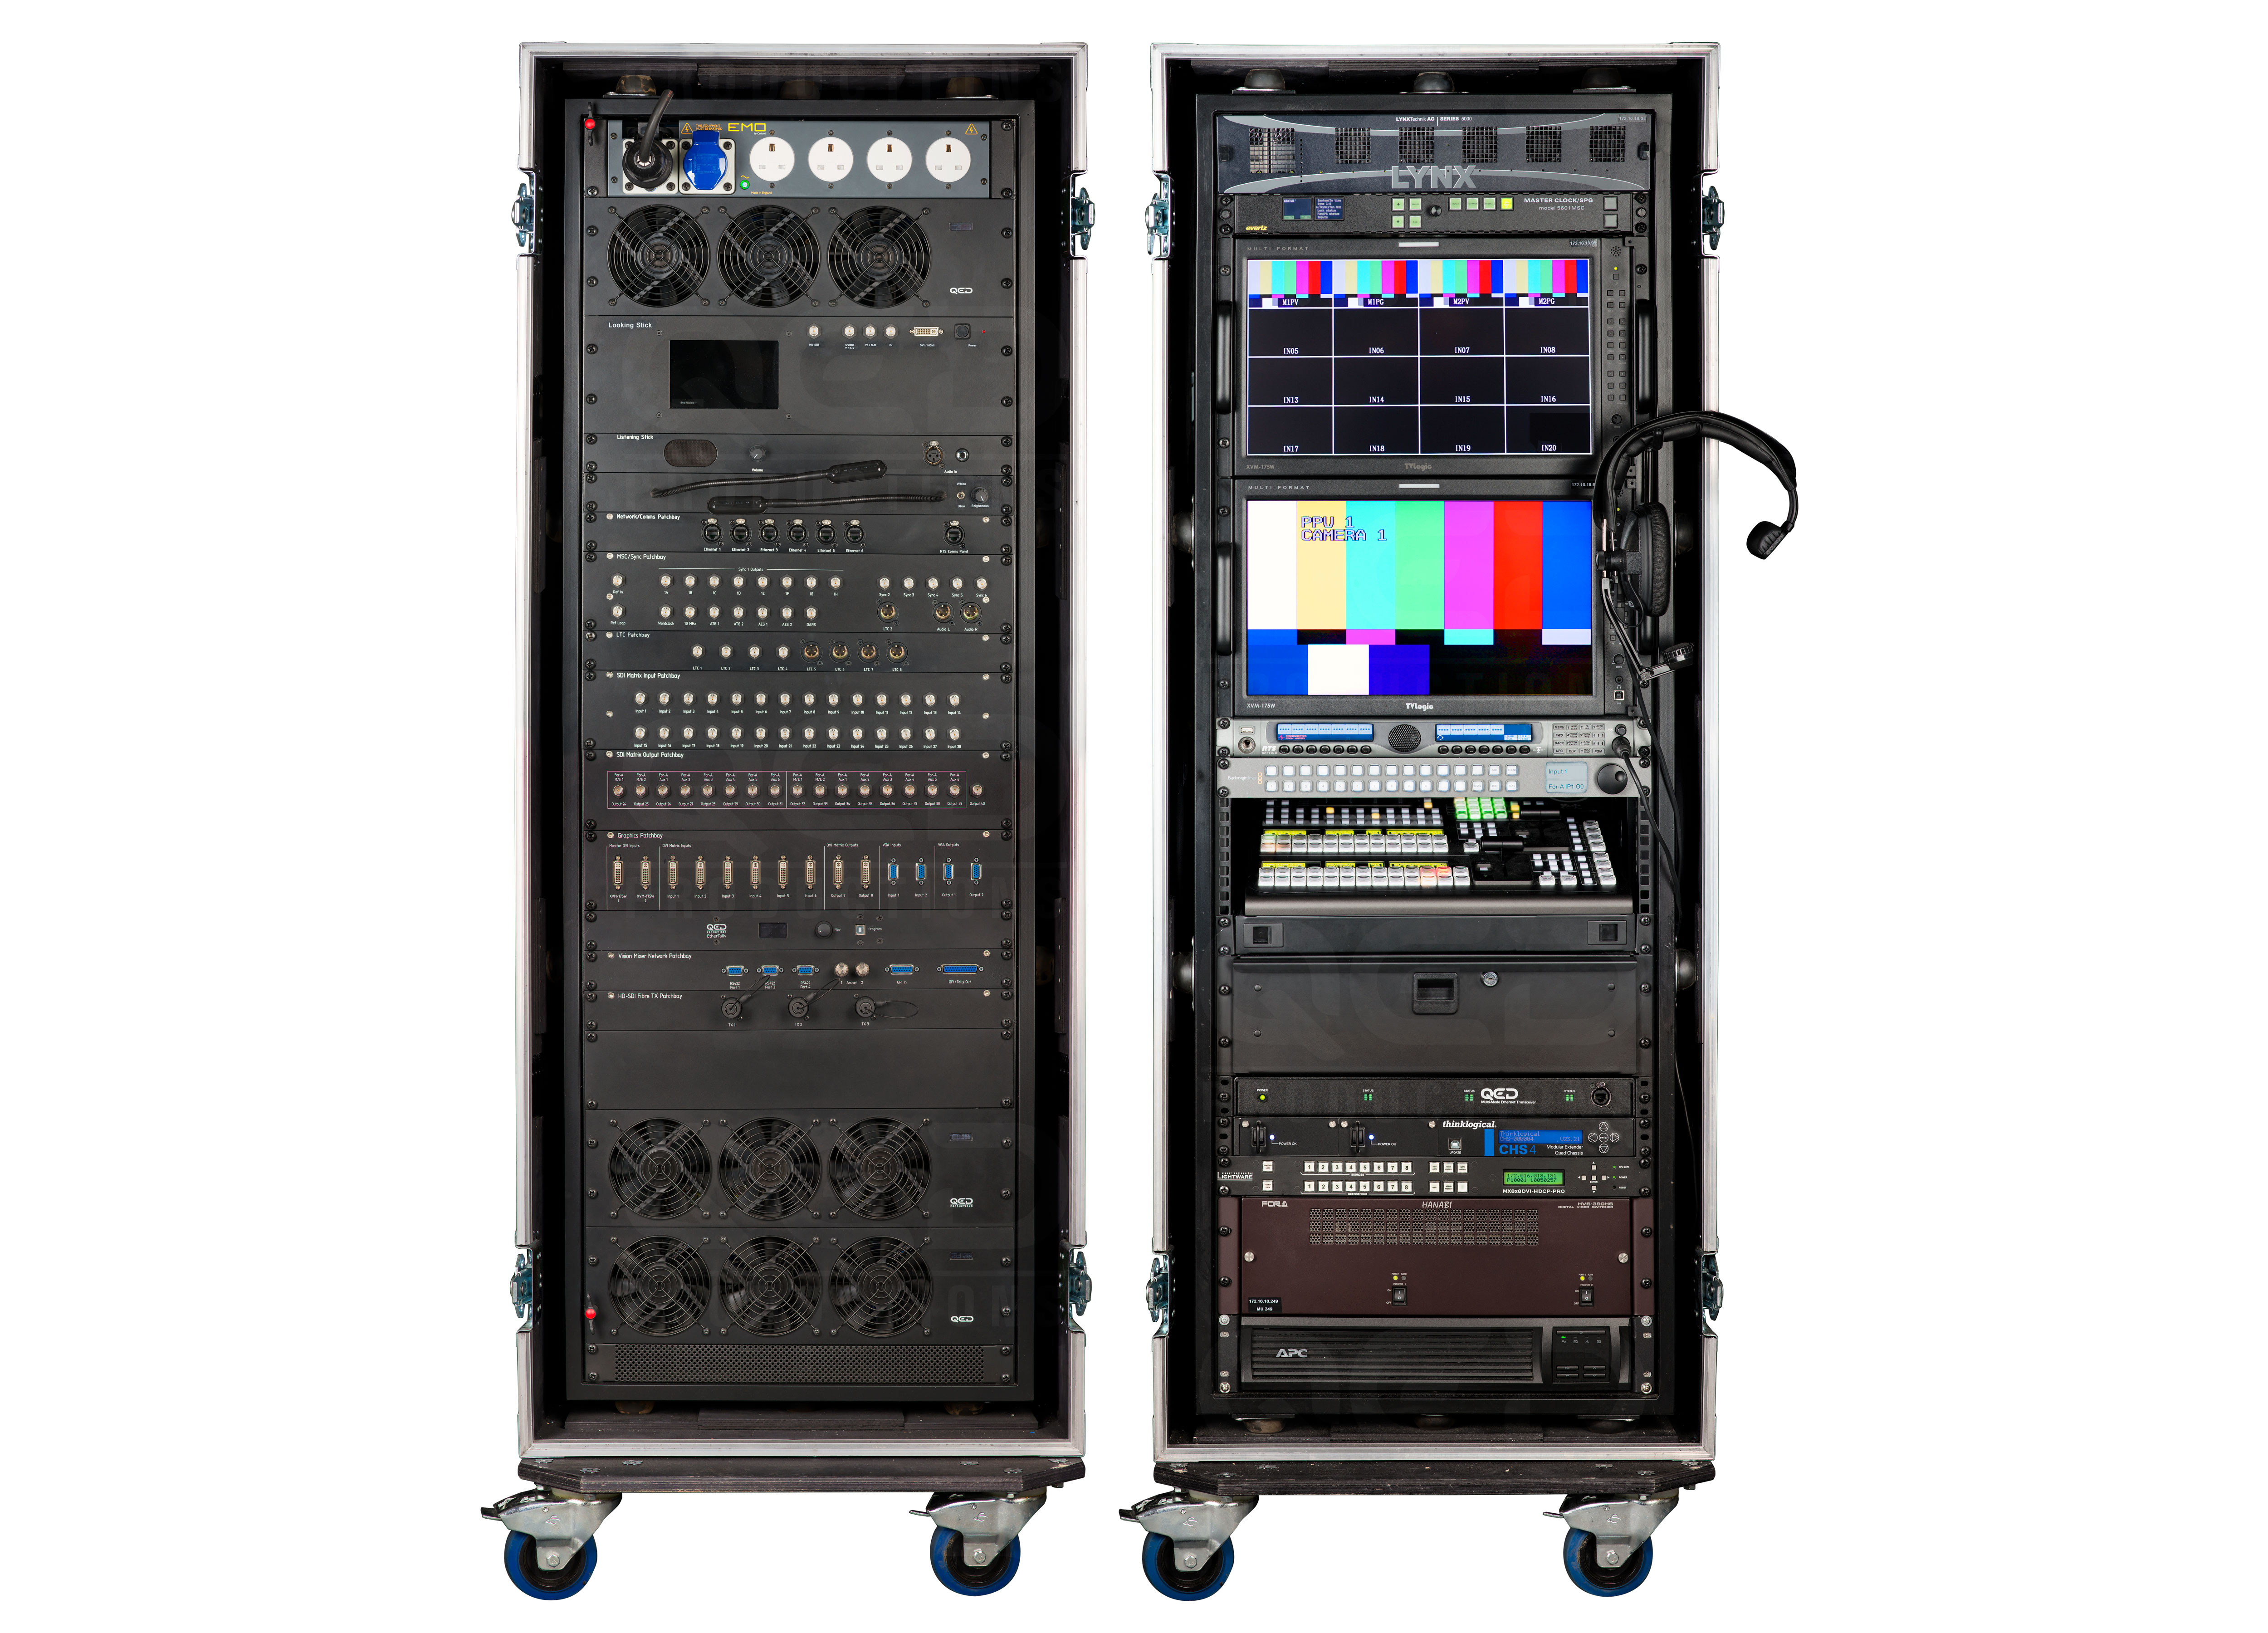 Test Equipment Racks : Qed productions equipment production rack